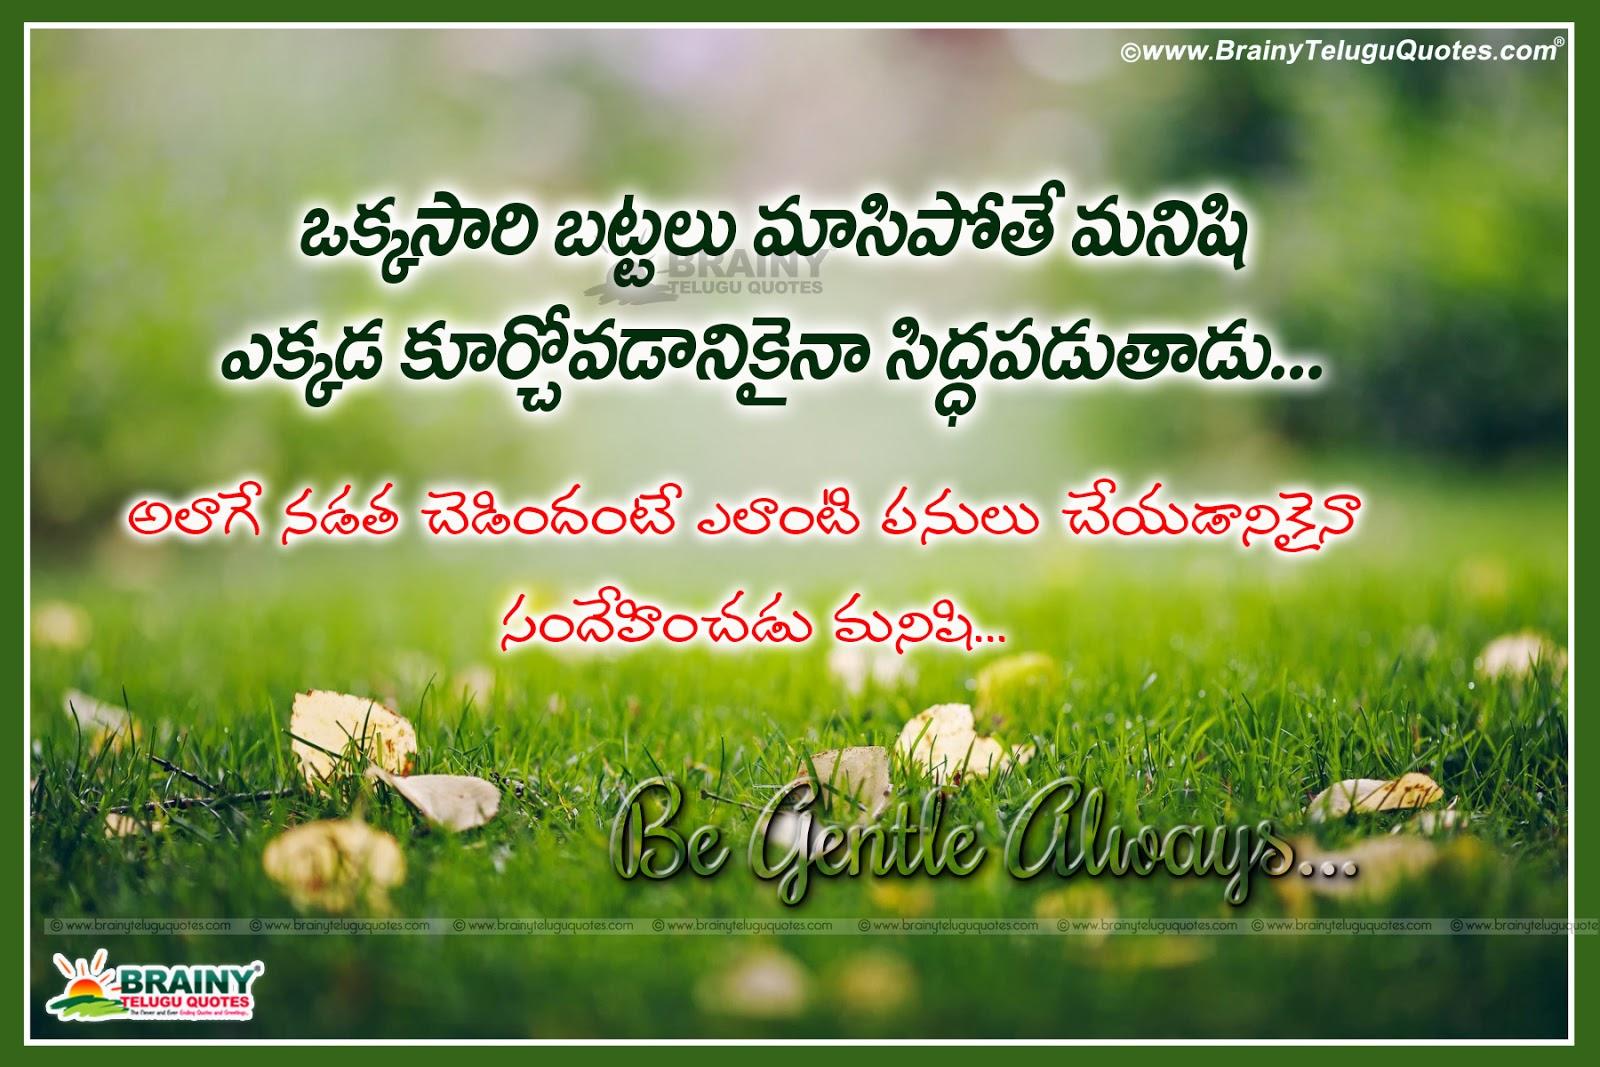 Human Nature Quotes In Hindi